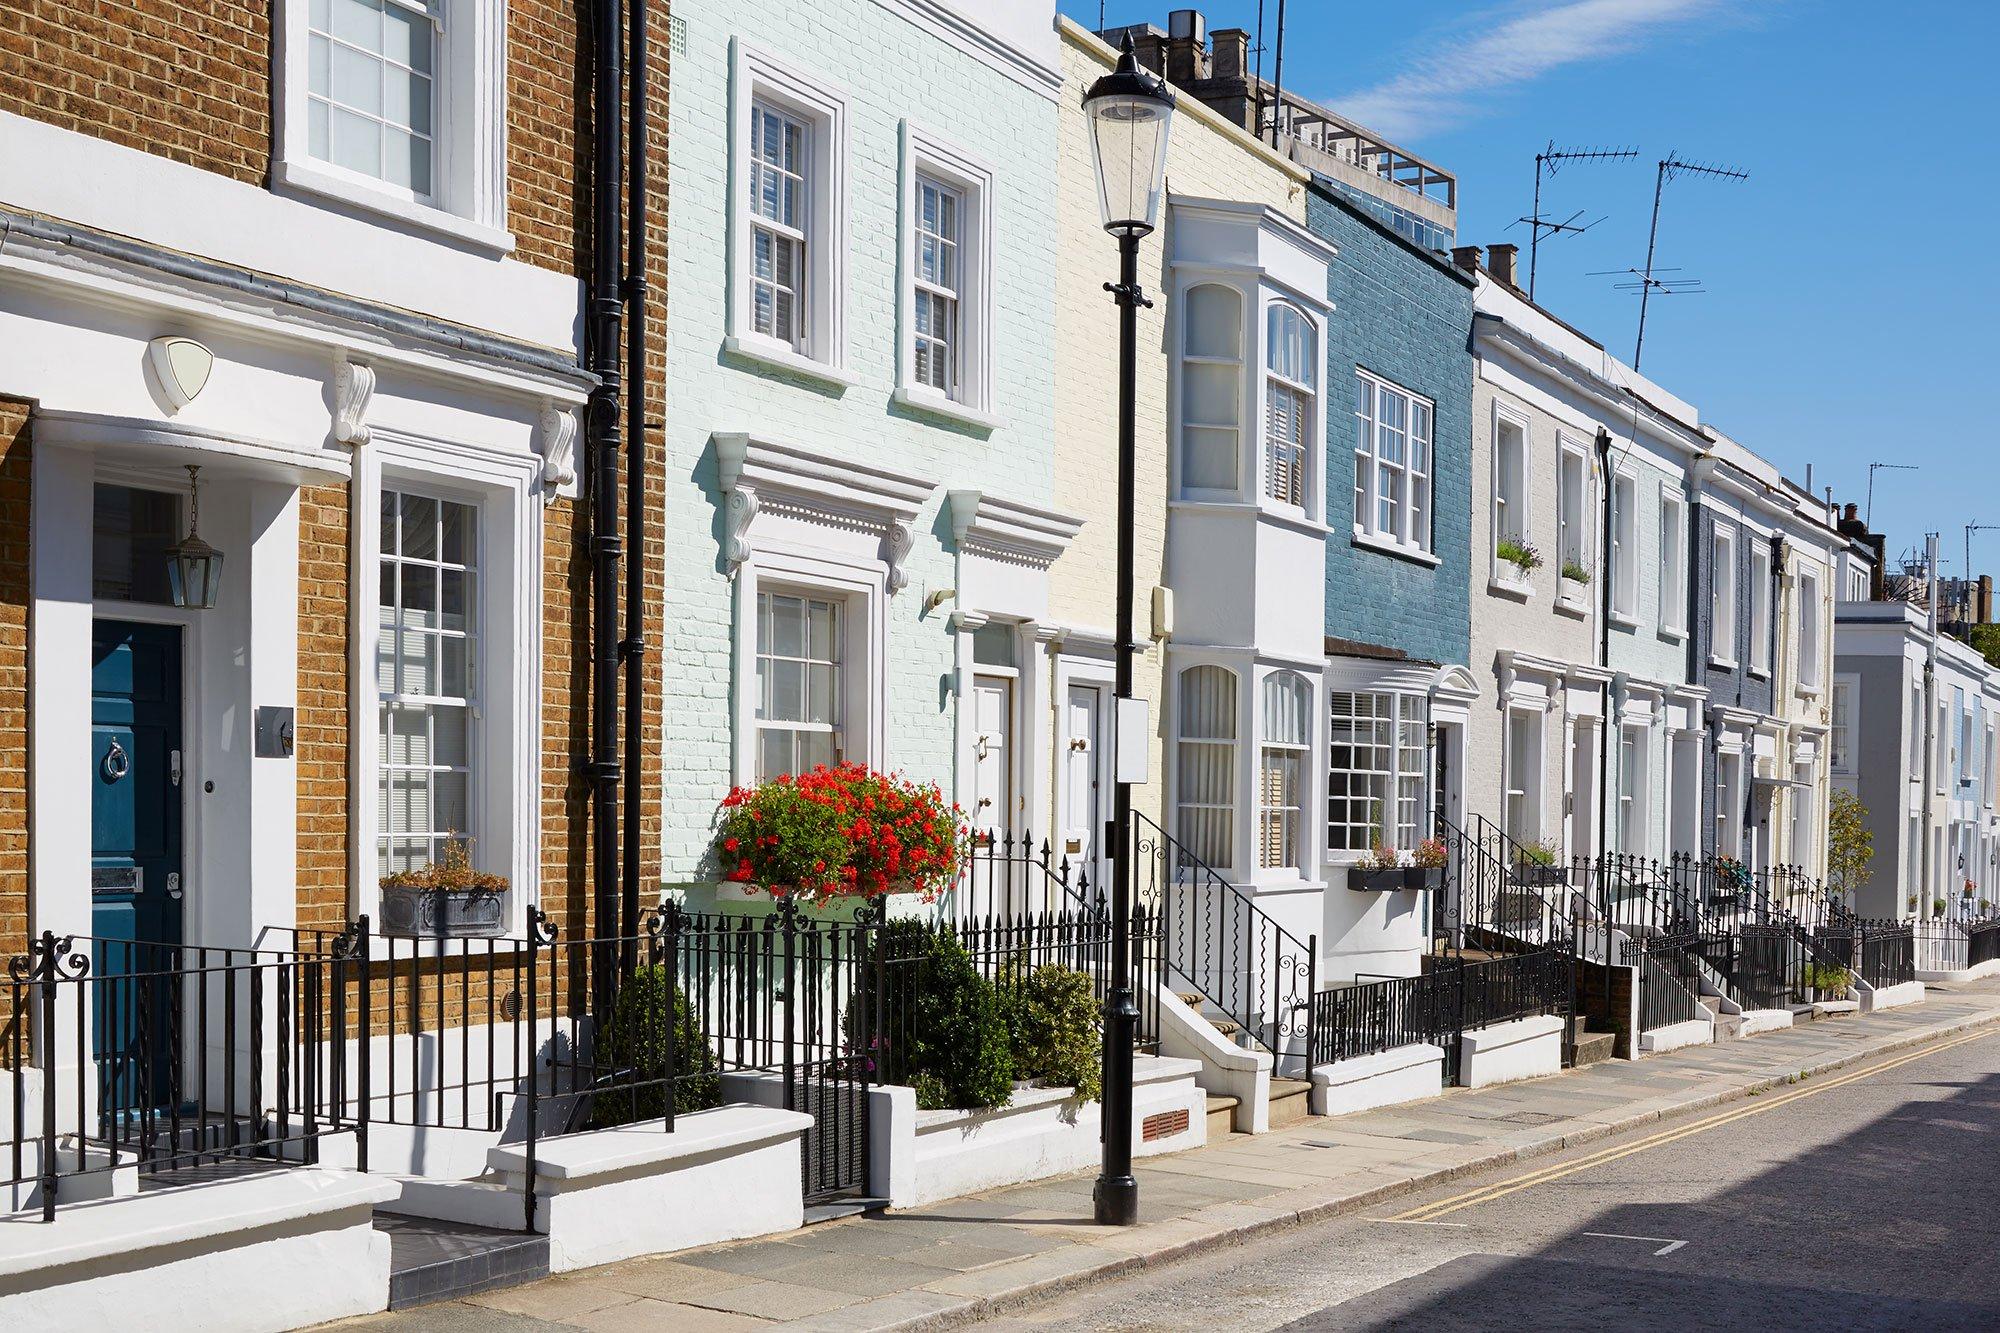 Row houses England